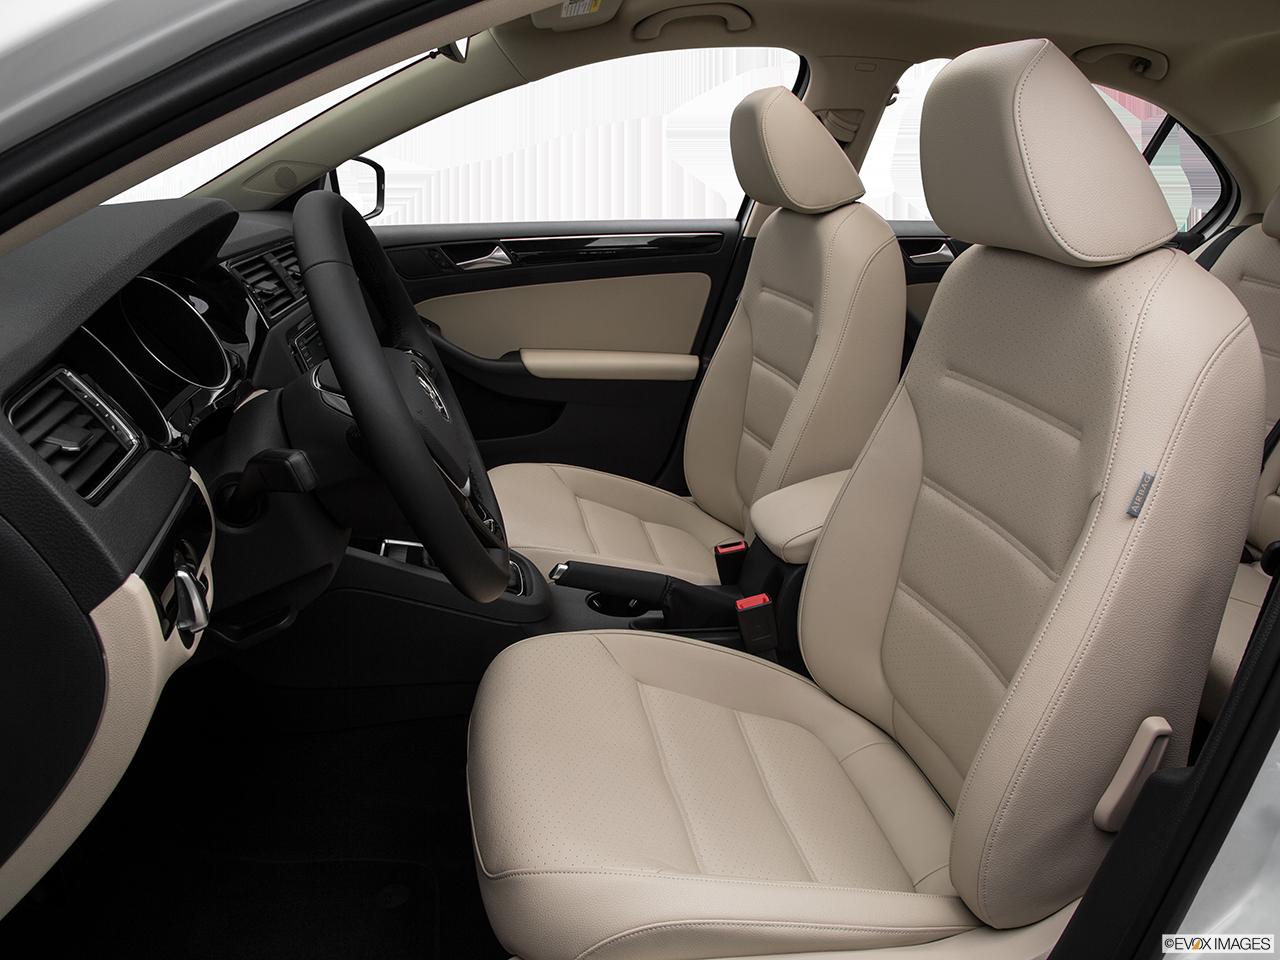 Research The 2017 Volkswagen Jetta in Franklin